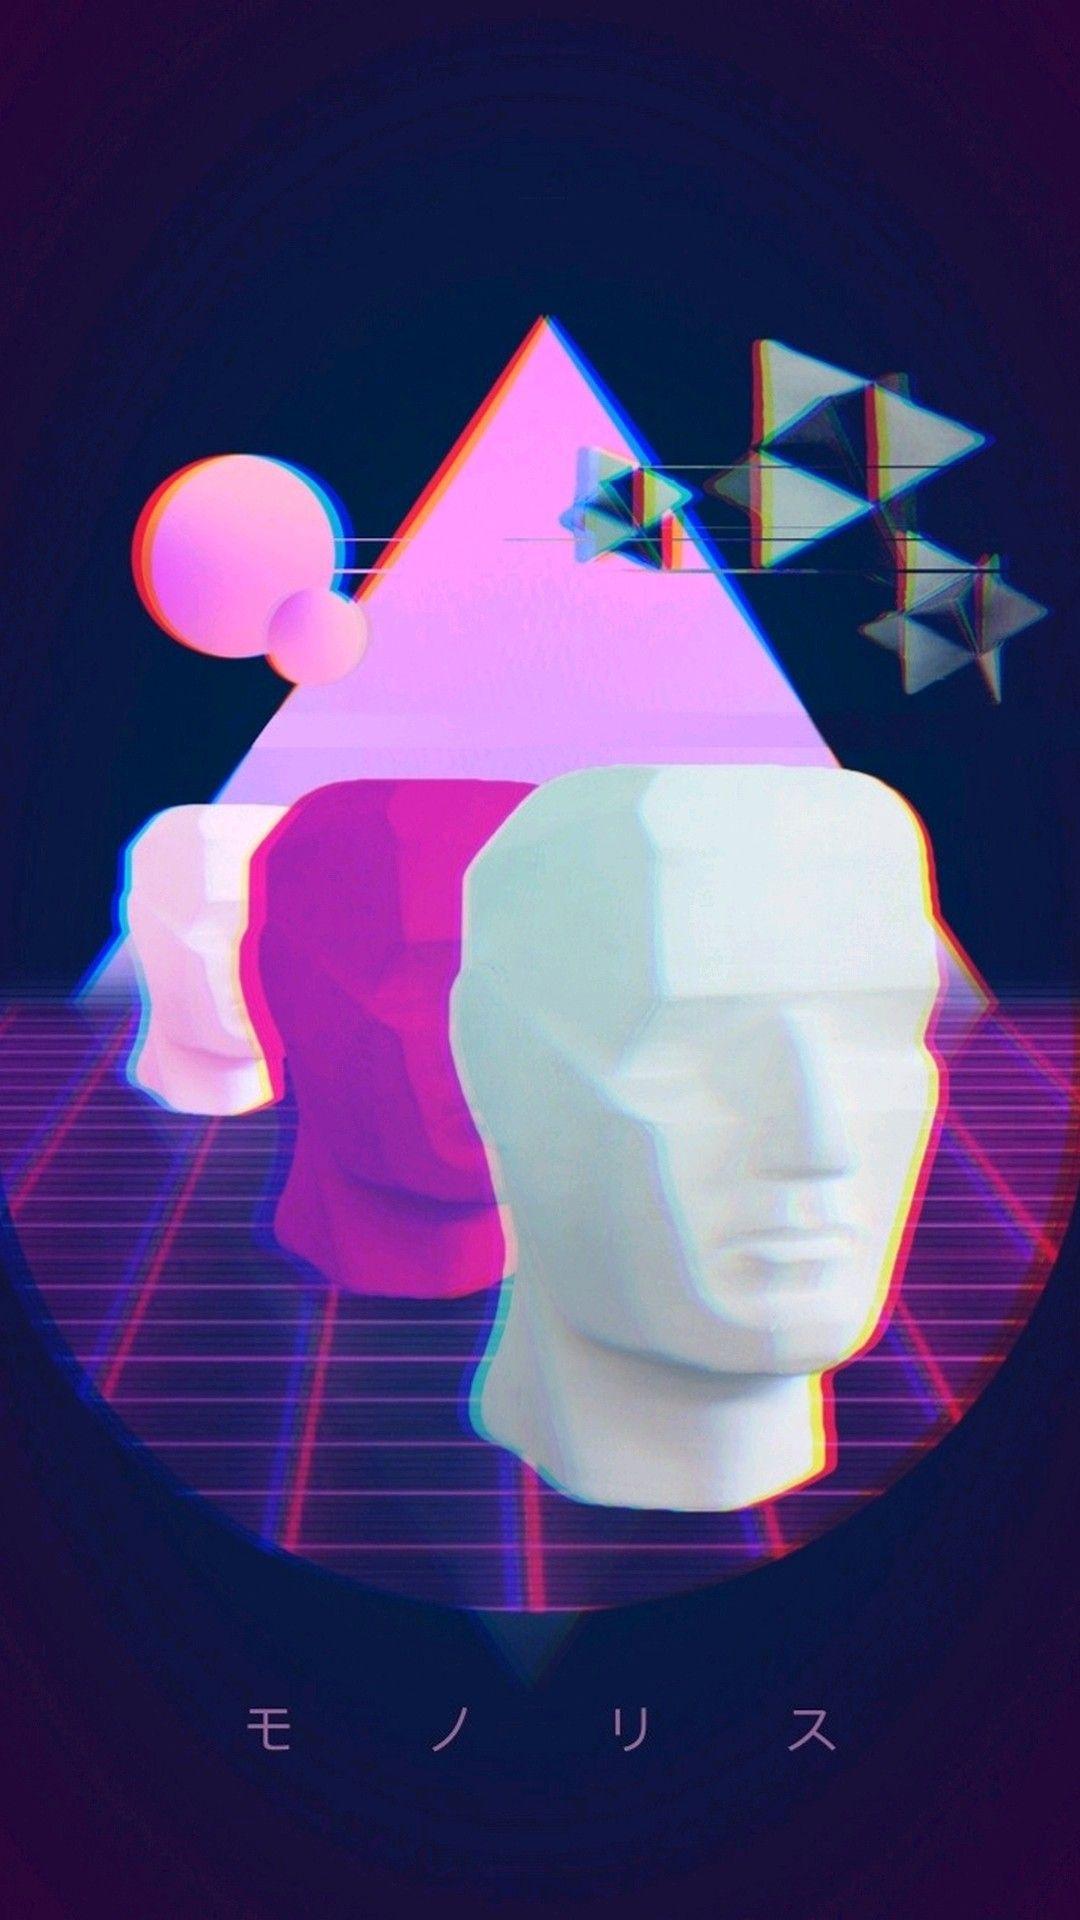 Pin by kalminrot on ART Vaporwave wallpaper, Vaporwave